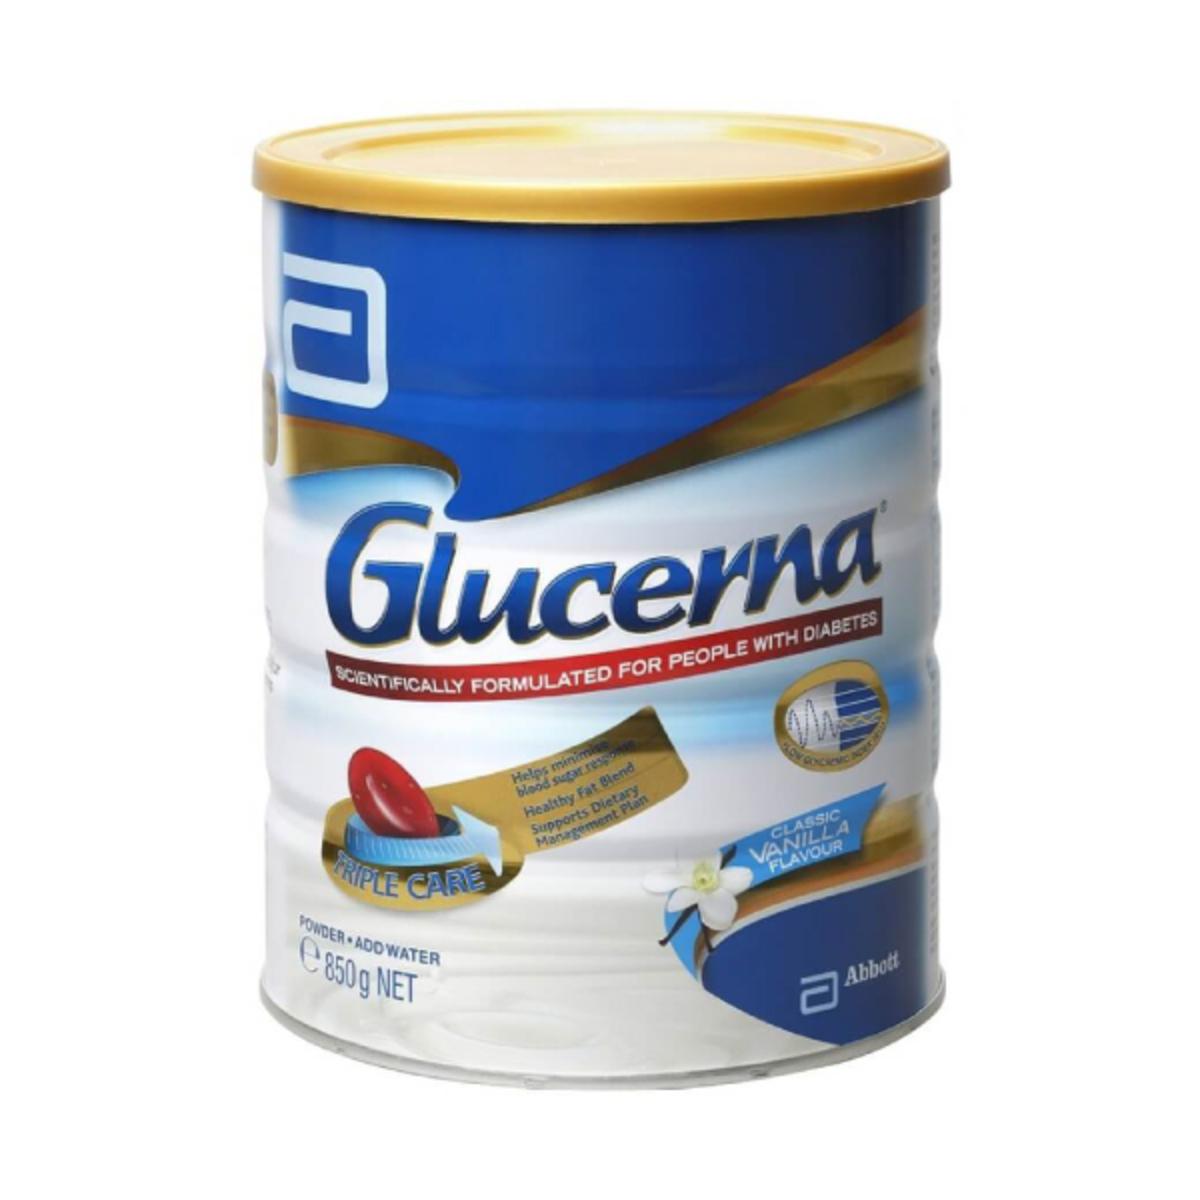 Glucerna Triple Care Milk Powder 850g 18184 Go Shop Nutren Diabetes